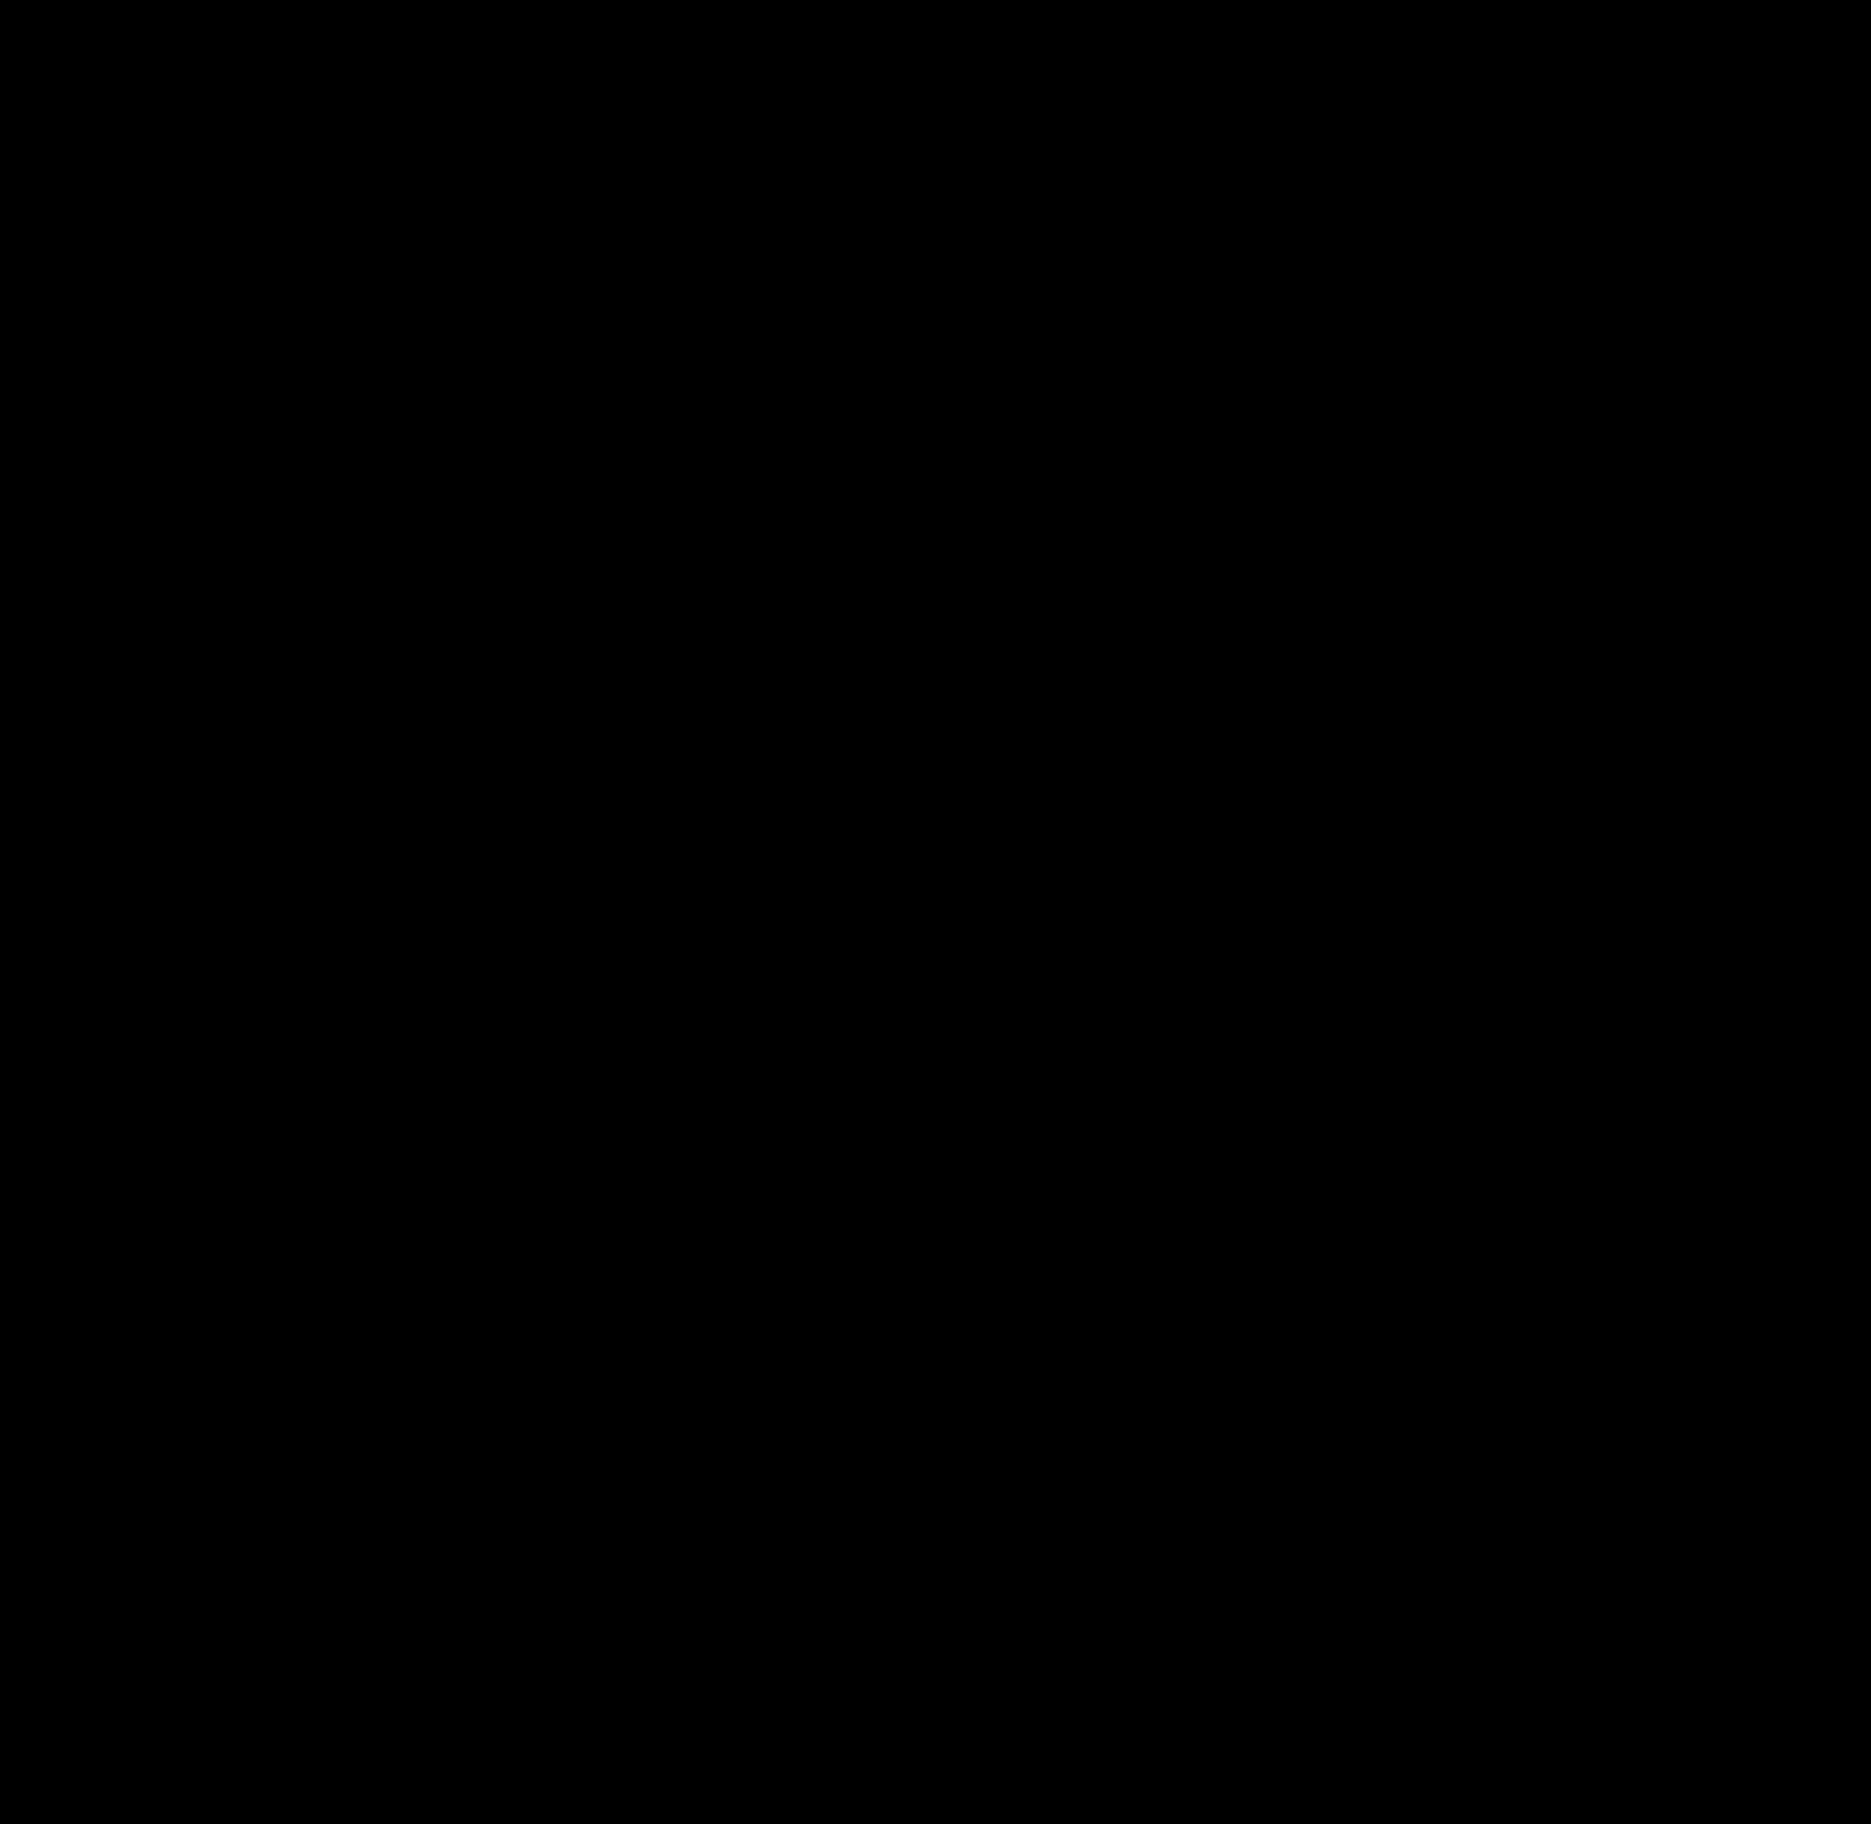 arrow-left-solid.png